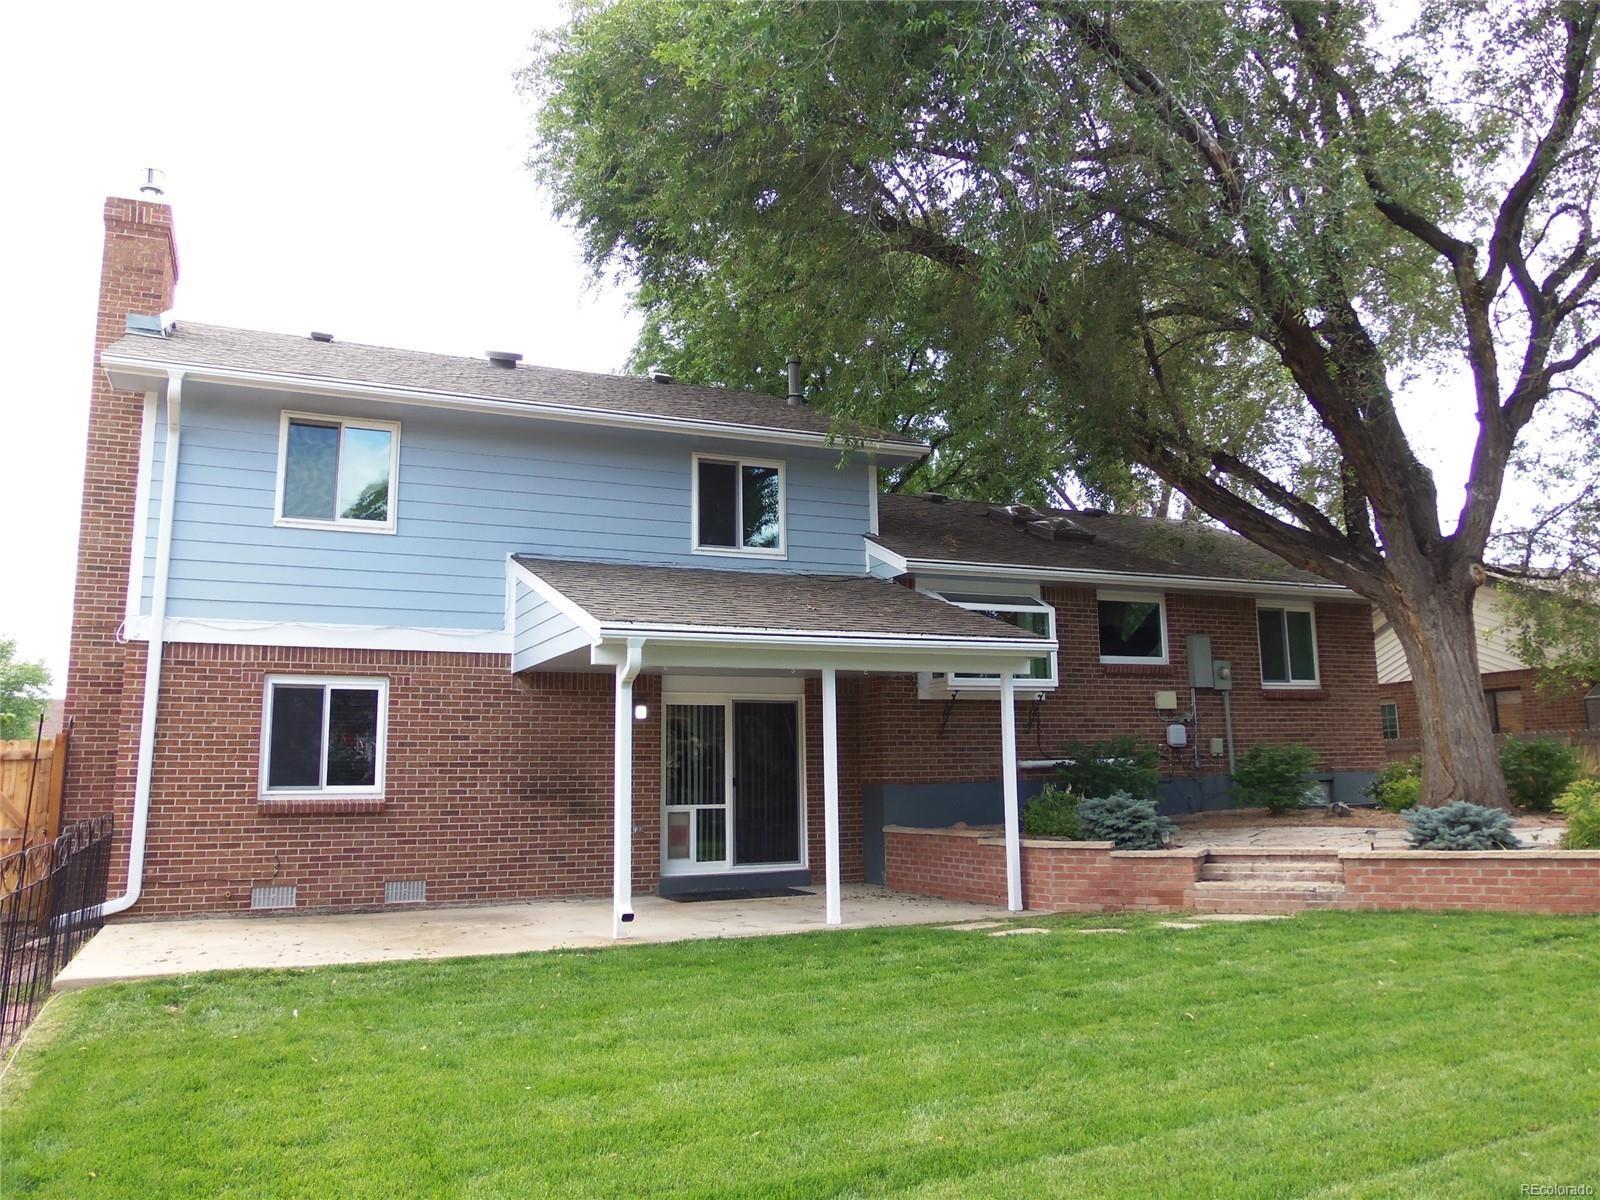 MLS# 5993198 - 3 - 3839 E 133rd Circle, Thornton, CO 80241